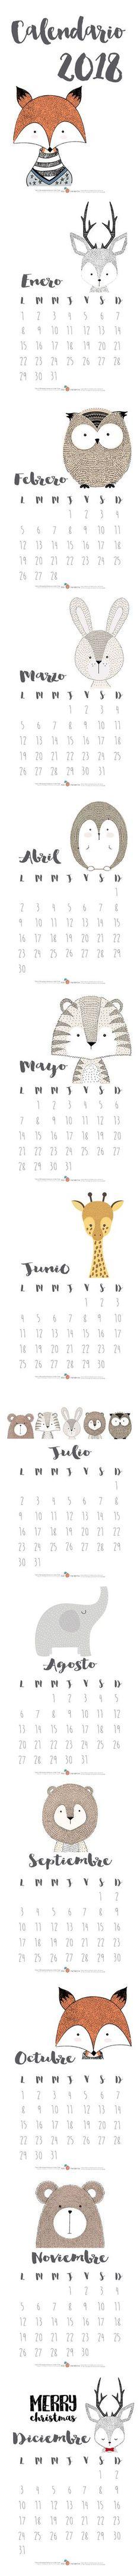 Calendario 2018 Mia mandarina. Ilustraciones de Sabrin Deirani